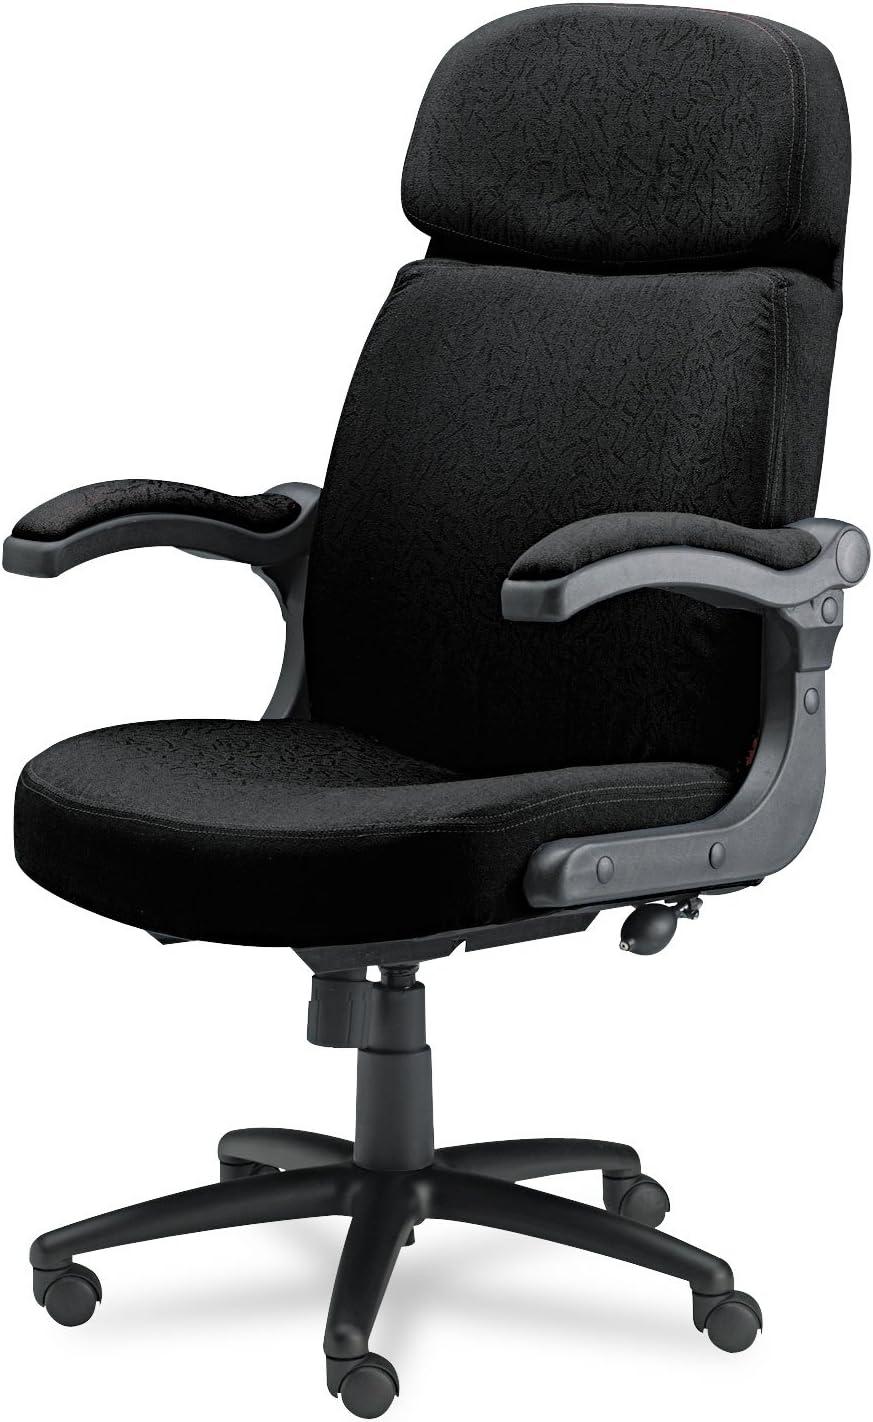 Mayline Big Tall Pivot Arm Chair Black Fabric